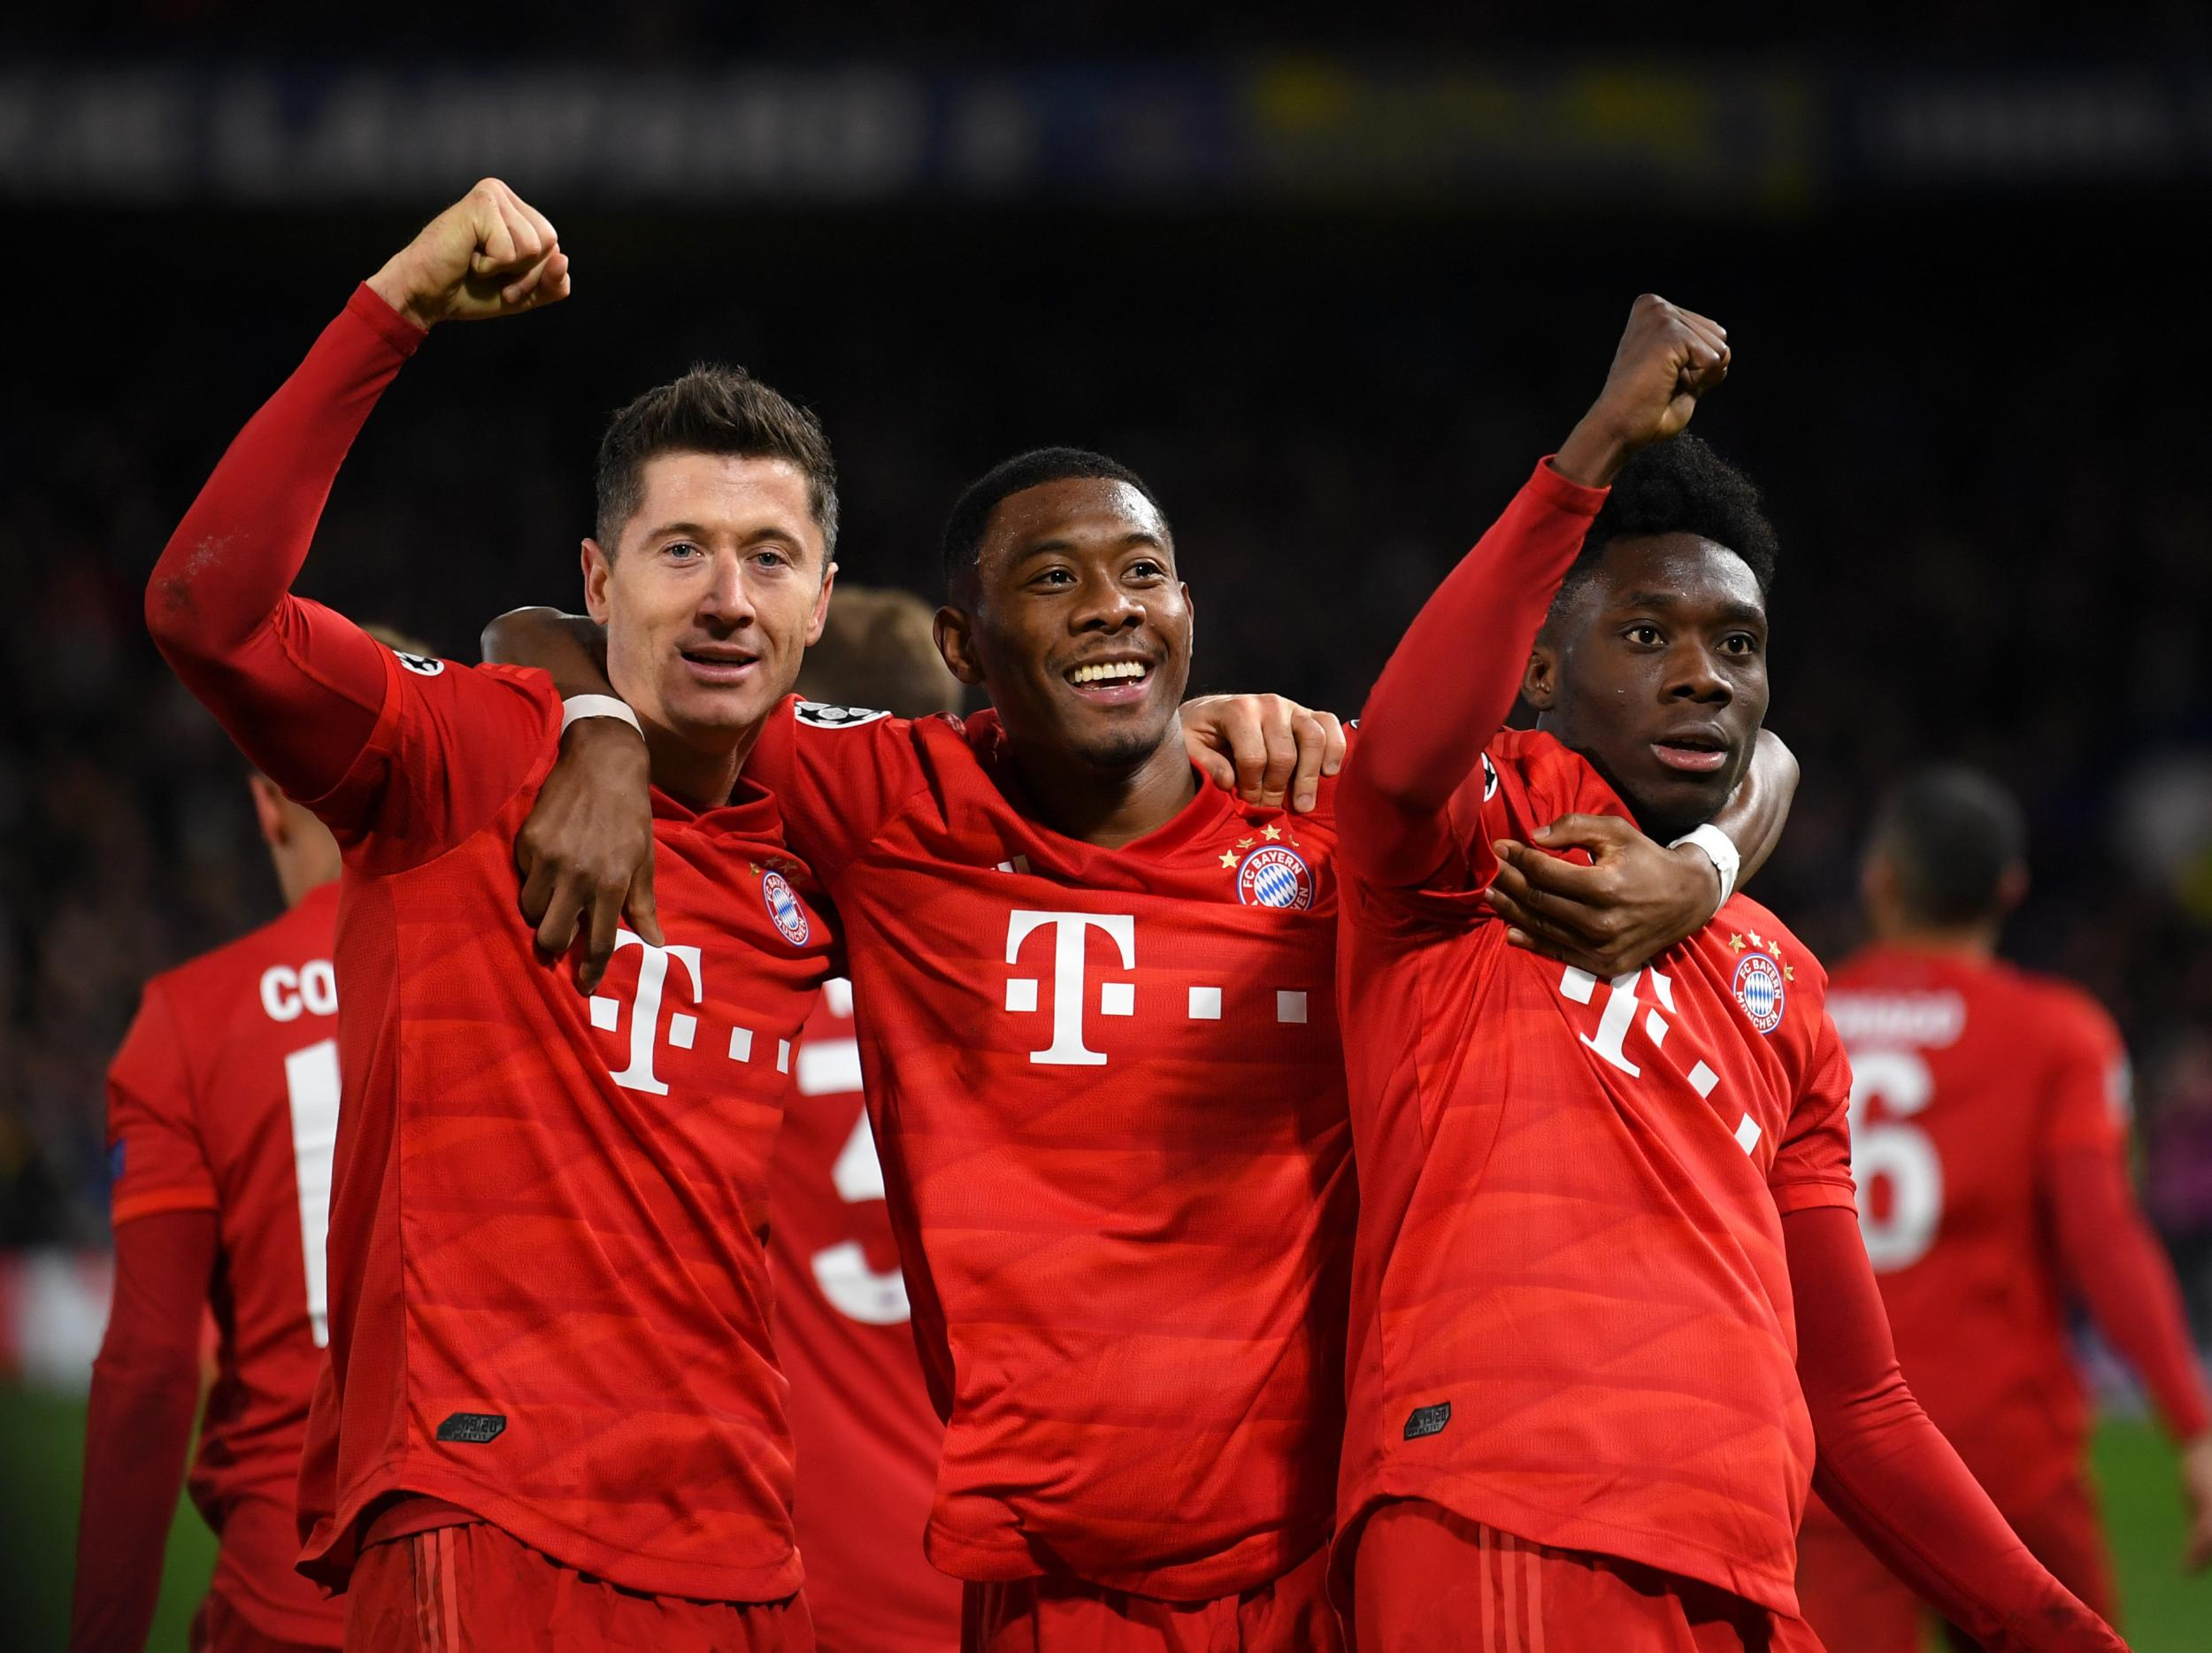 Borussia Dortmund vs Bayern Munich predicted line-ups: Team news and more ahead of Bundesliga fixture today